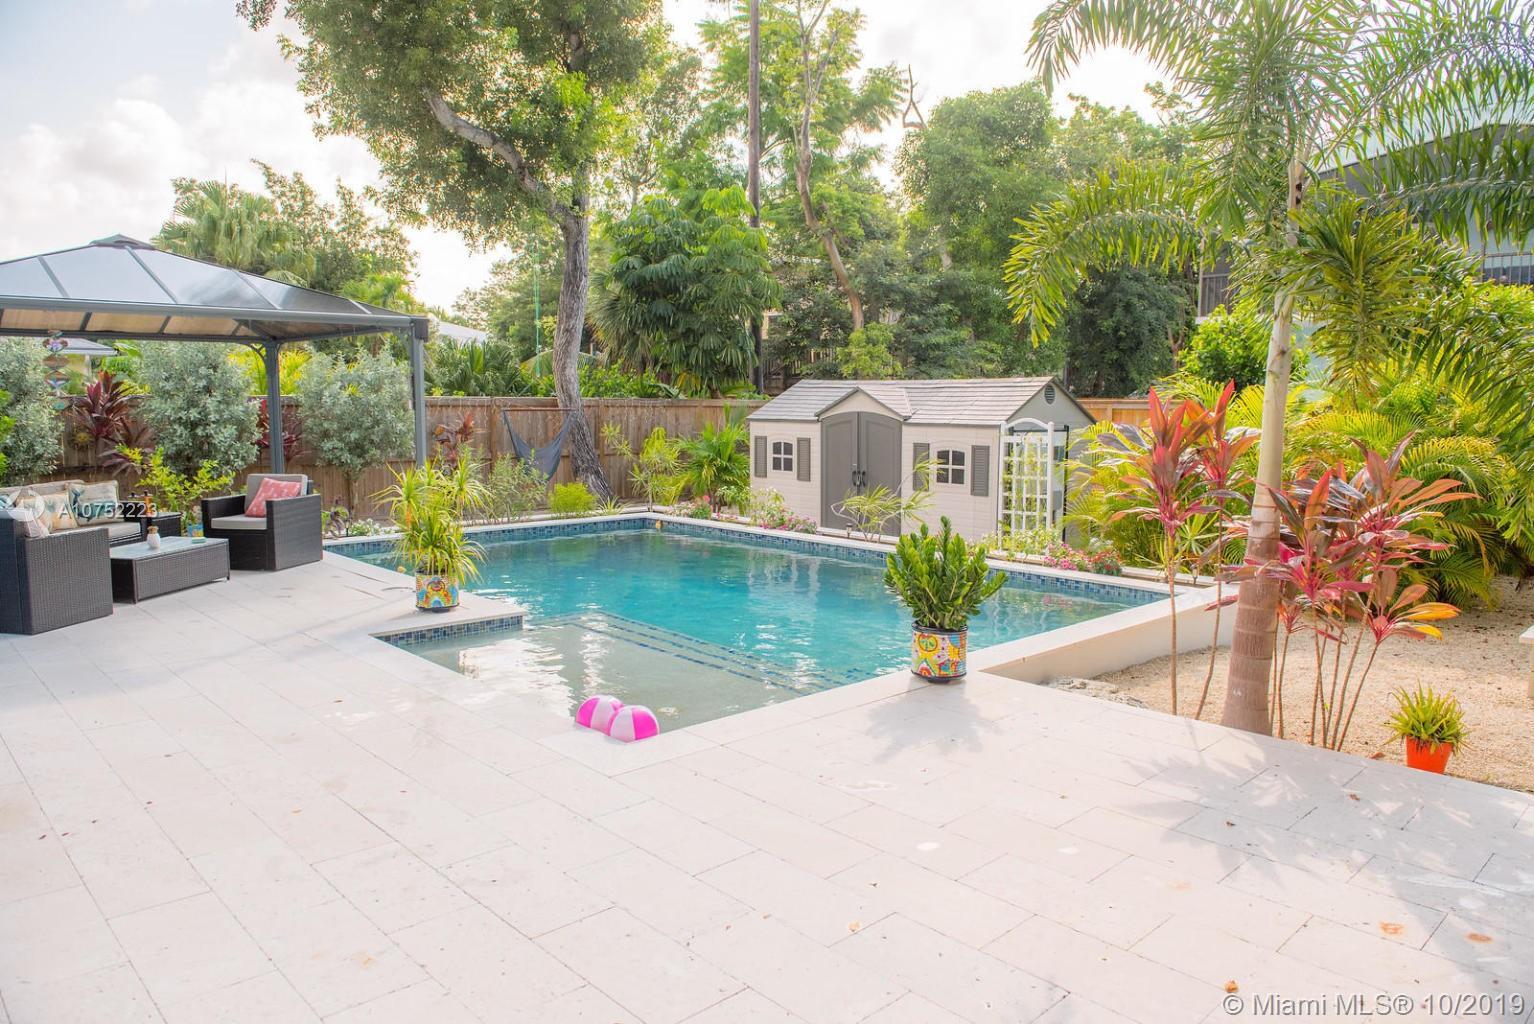 142 Pueblo St, Other City - Keys/Islands/Caribb, FL 33070 - Other City - Keys/Islands/Caribb, FL real estate listing